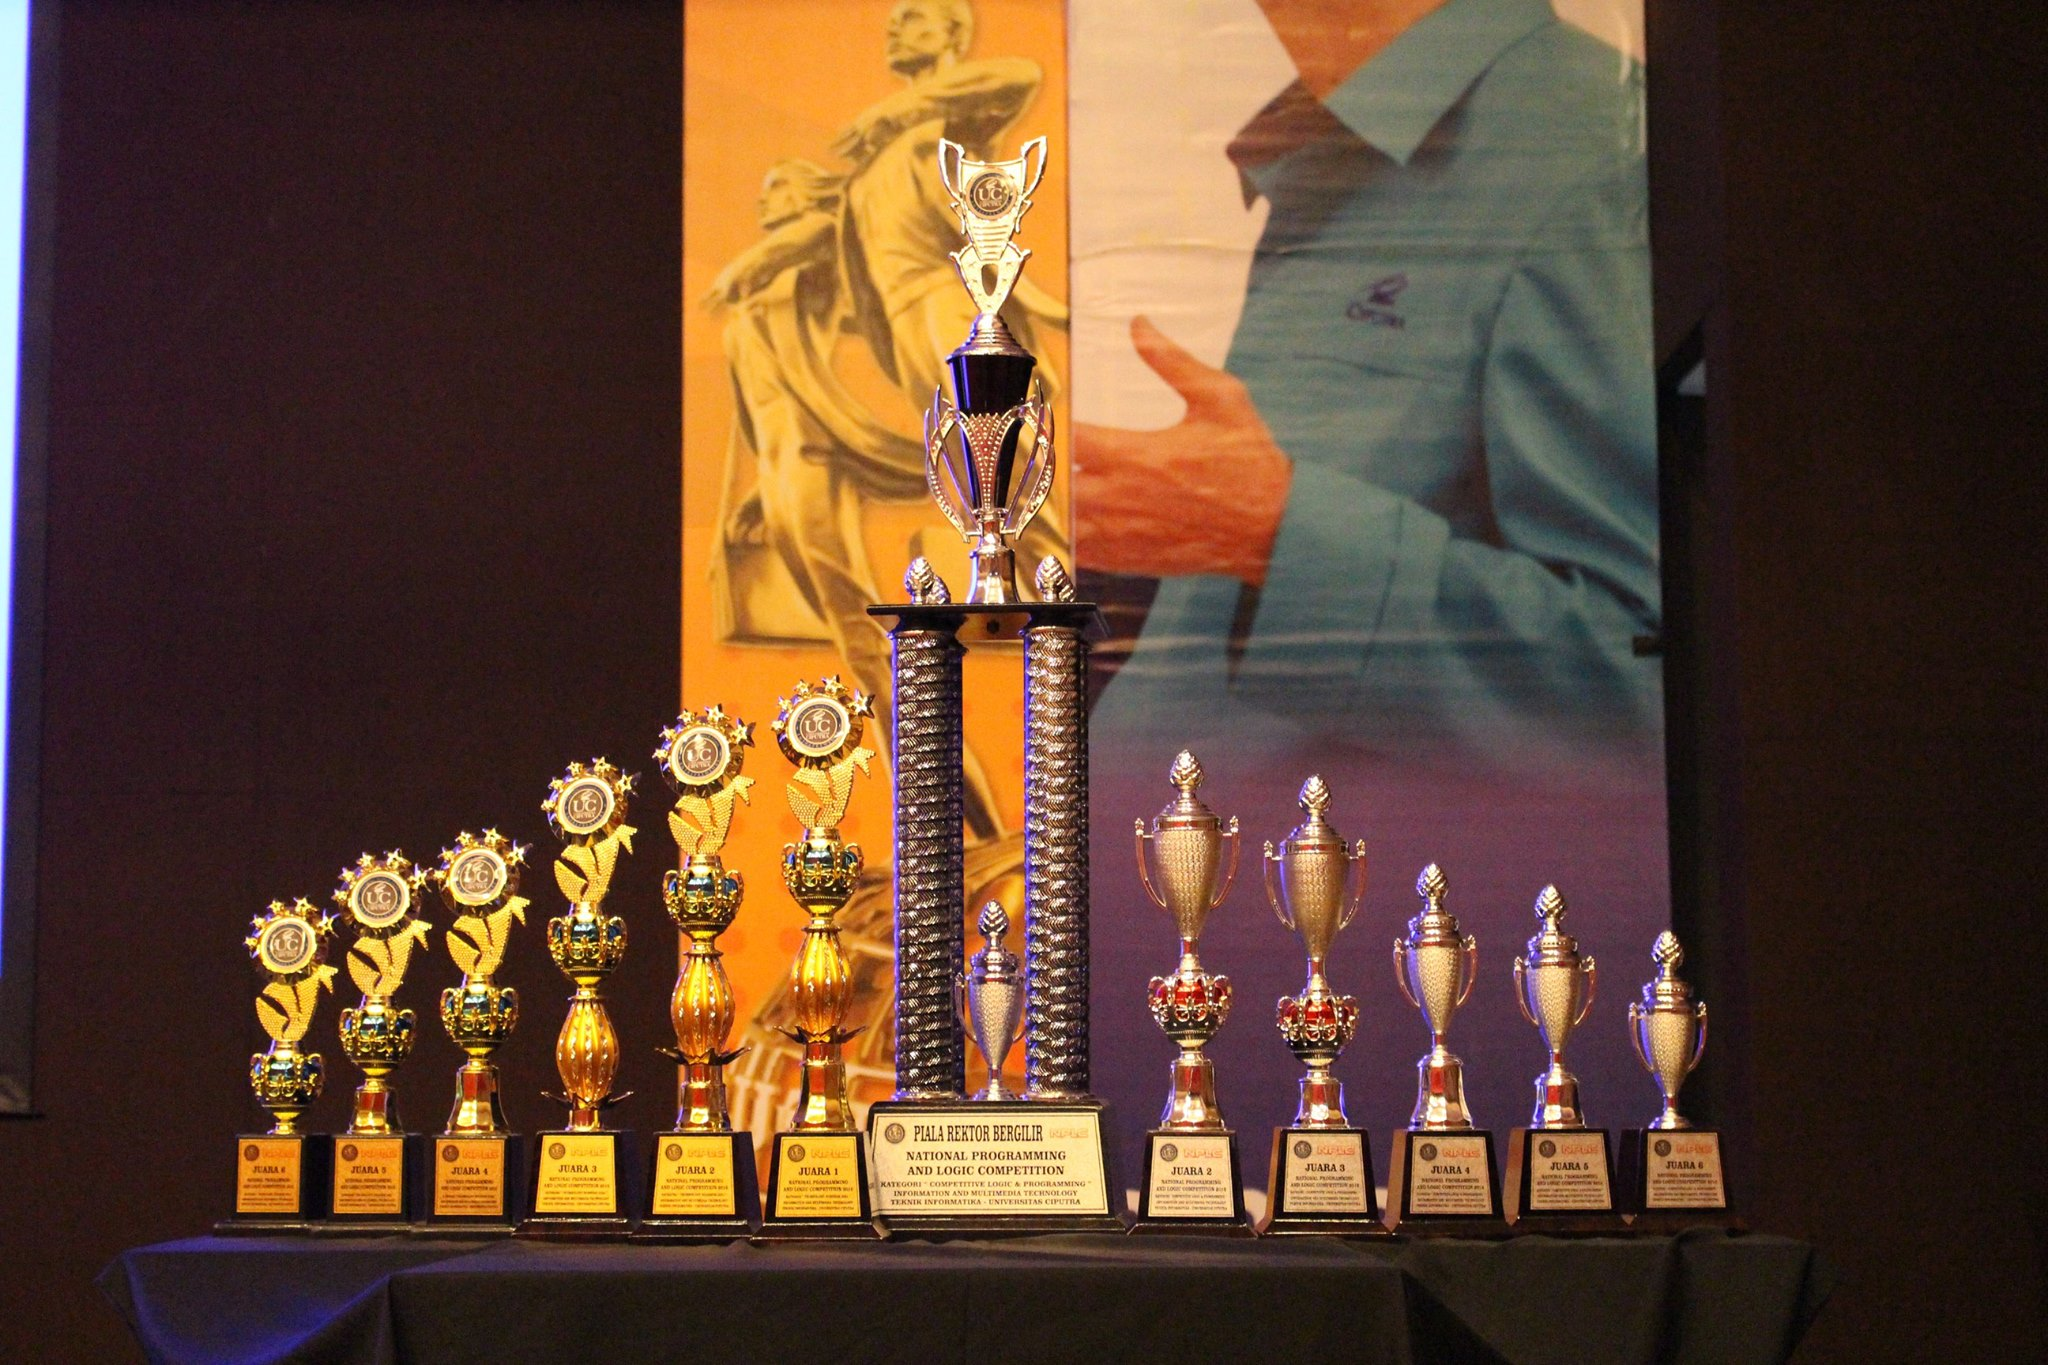 NPLC 2016 Trophy